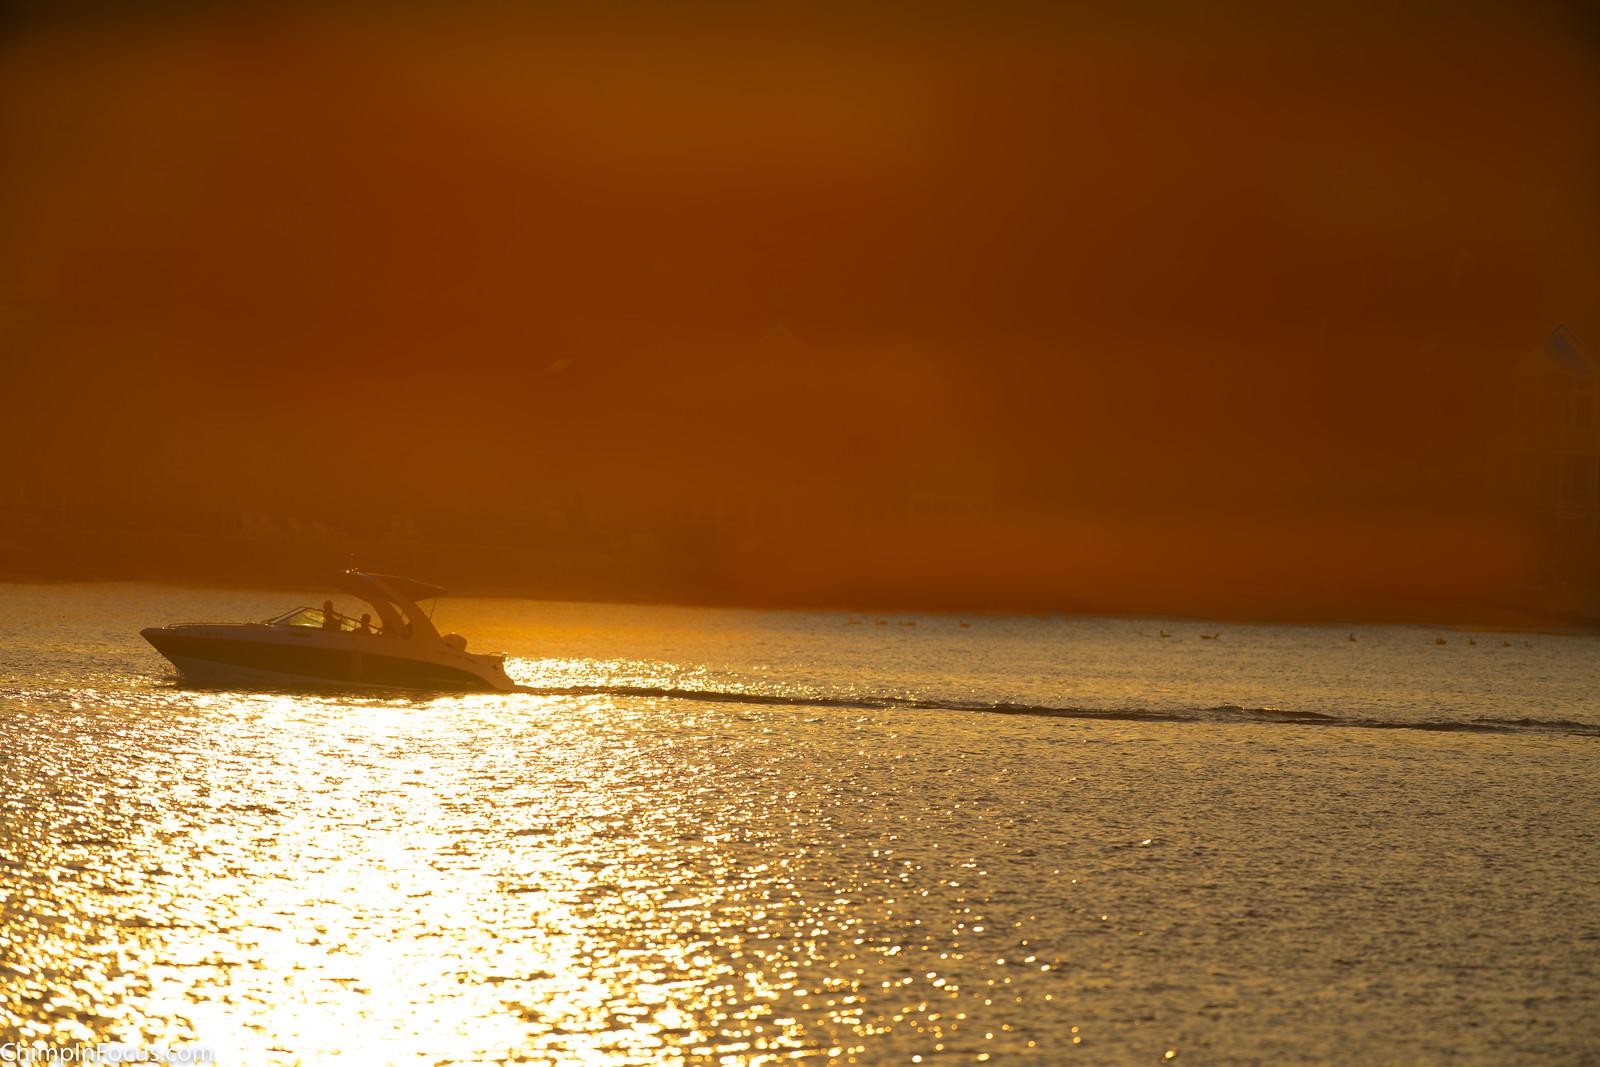 Cruising in the Sun